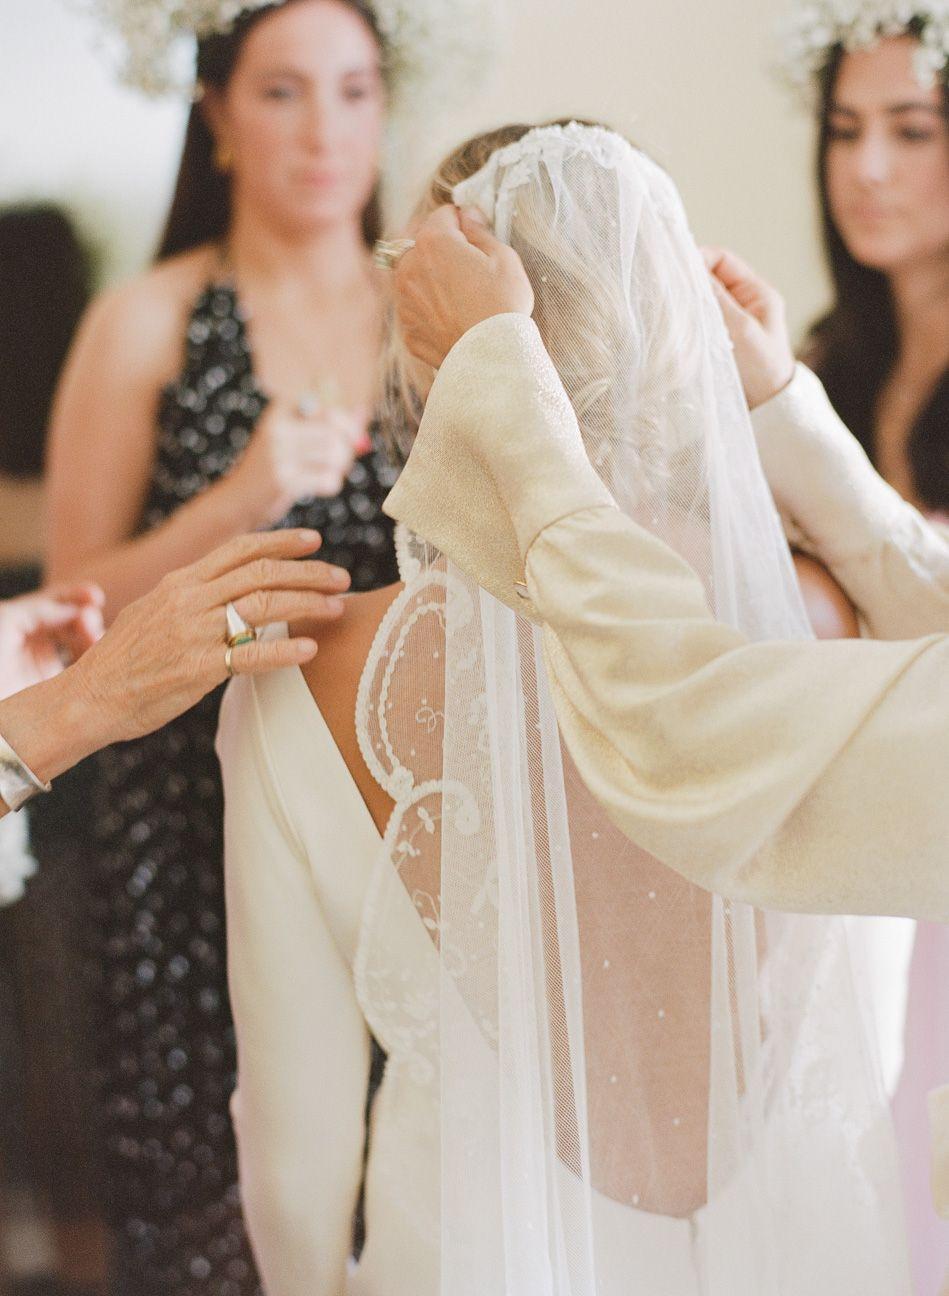 KareHillPhotography-Nassikas-Wedding-0184.jpg